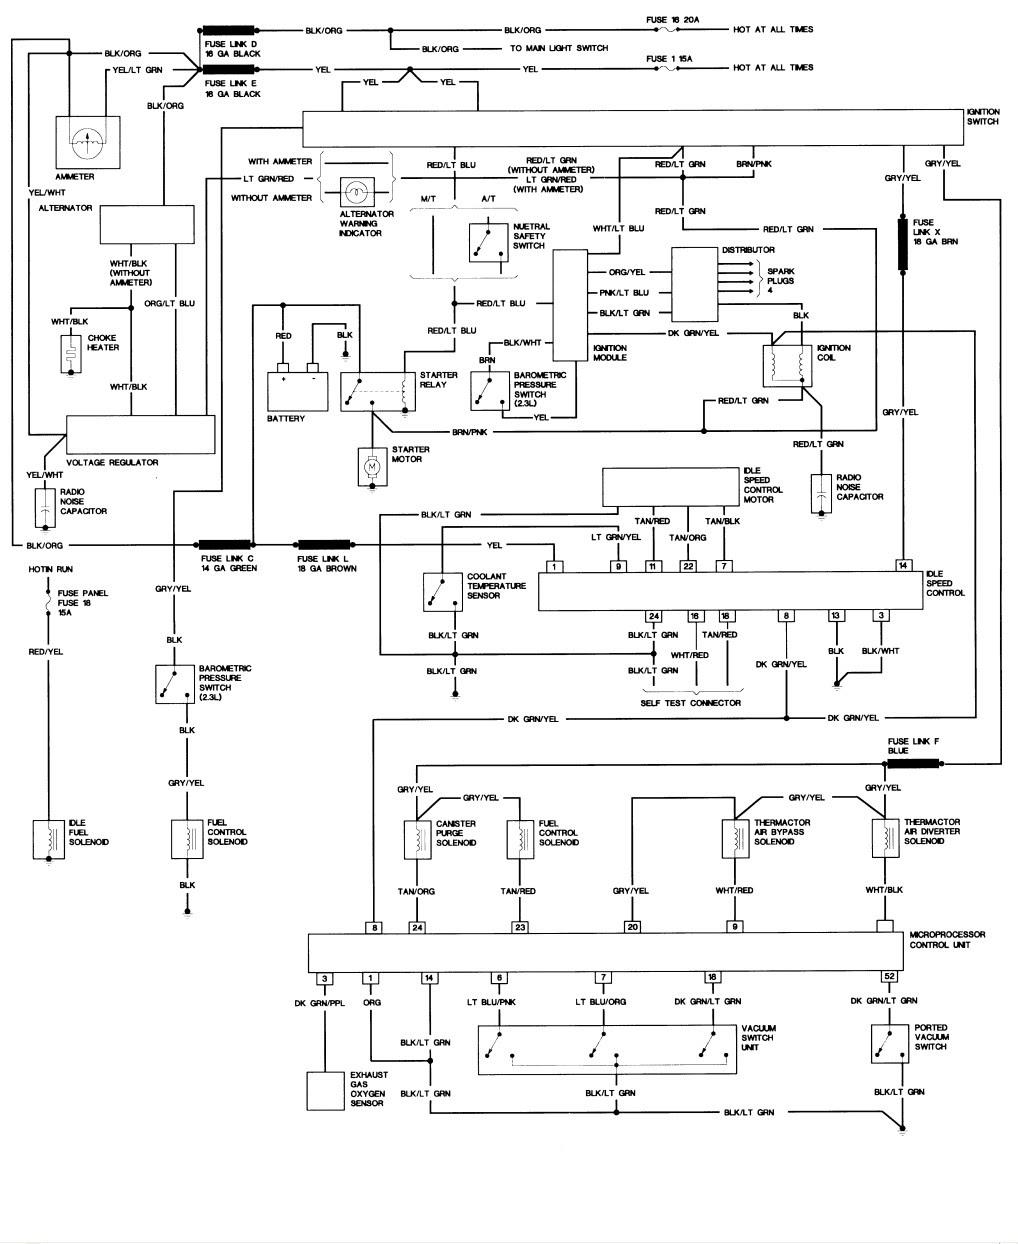 Diagram 1982 Ford Ranger Wiring Diagram Full Version Hd Quality Wiring Diagram Diagramedsonk Alintec It